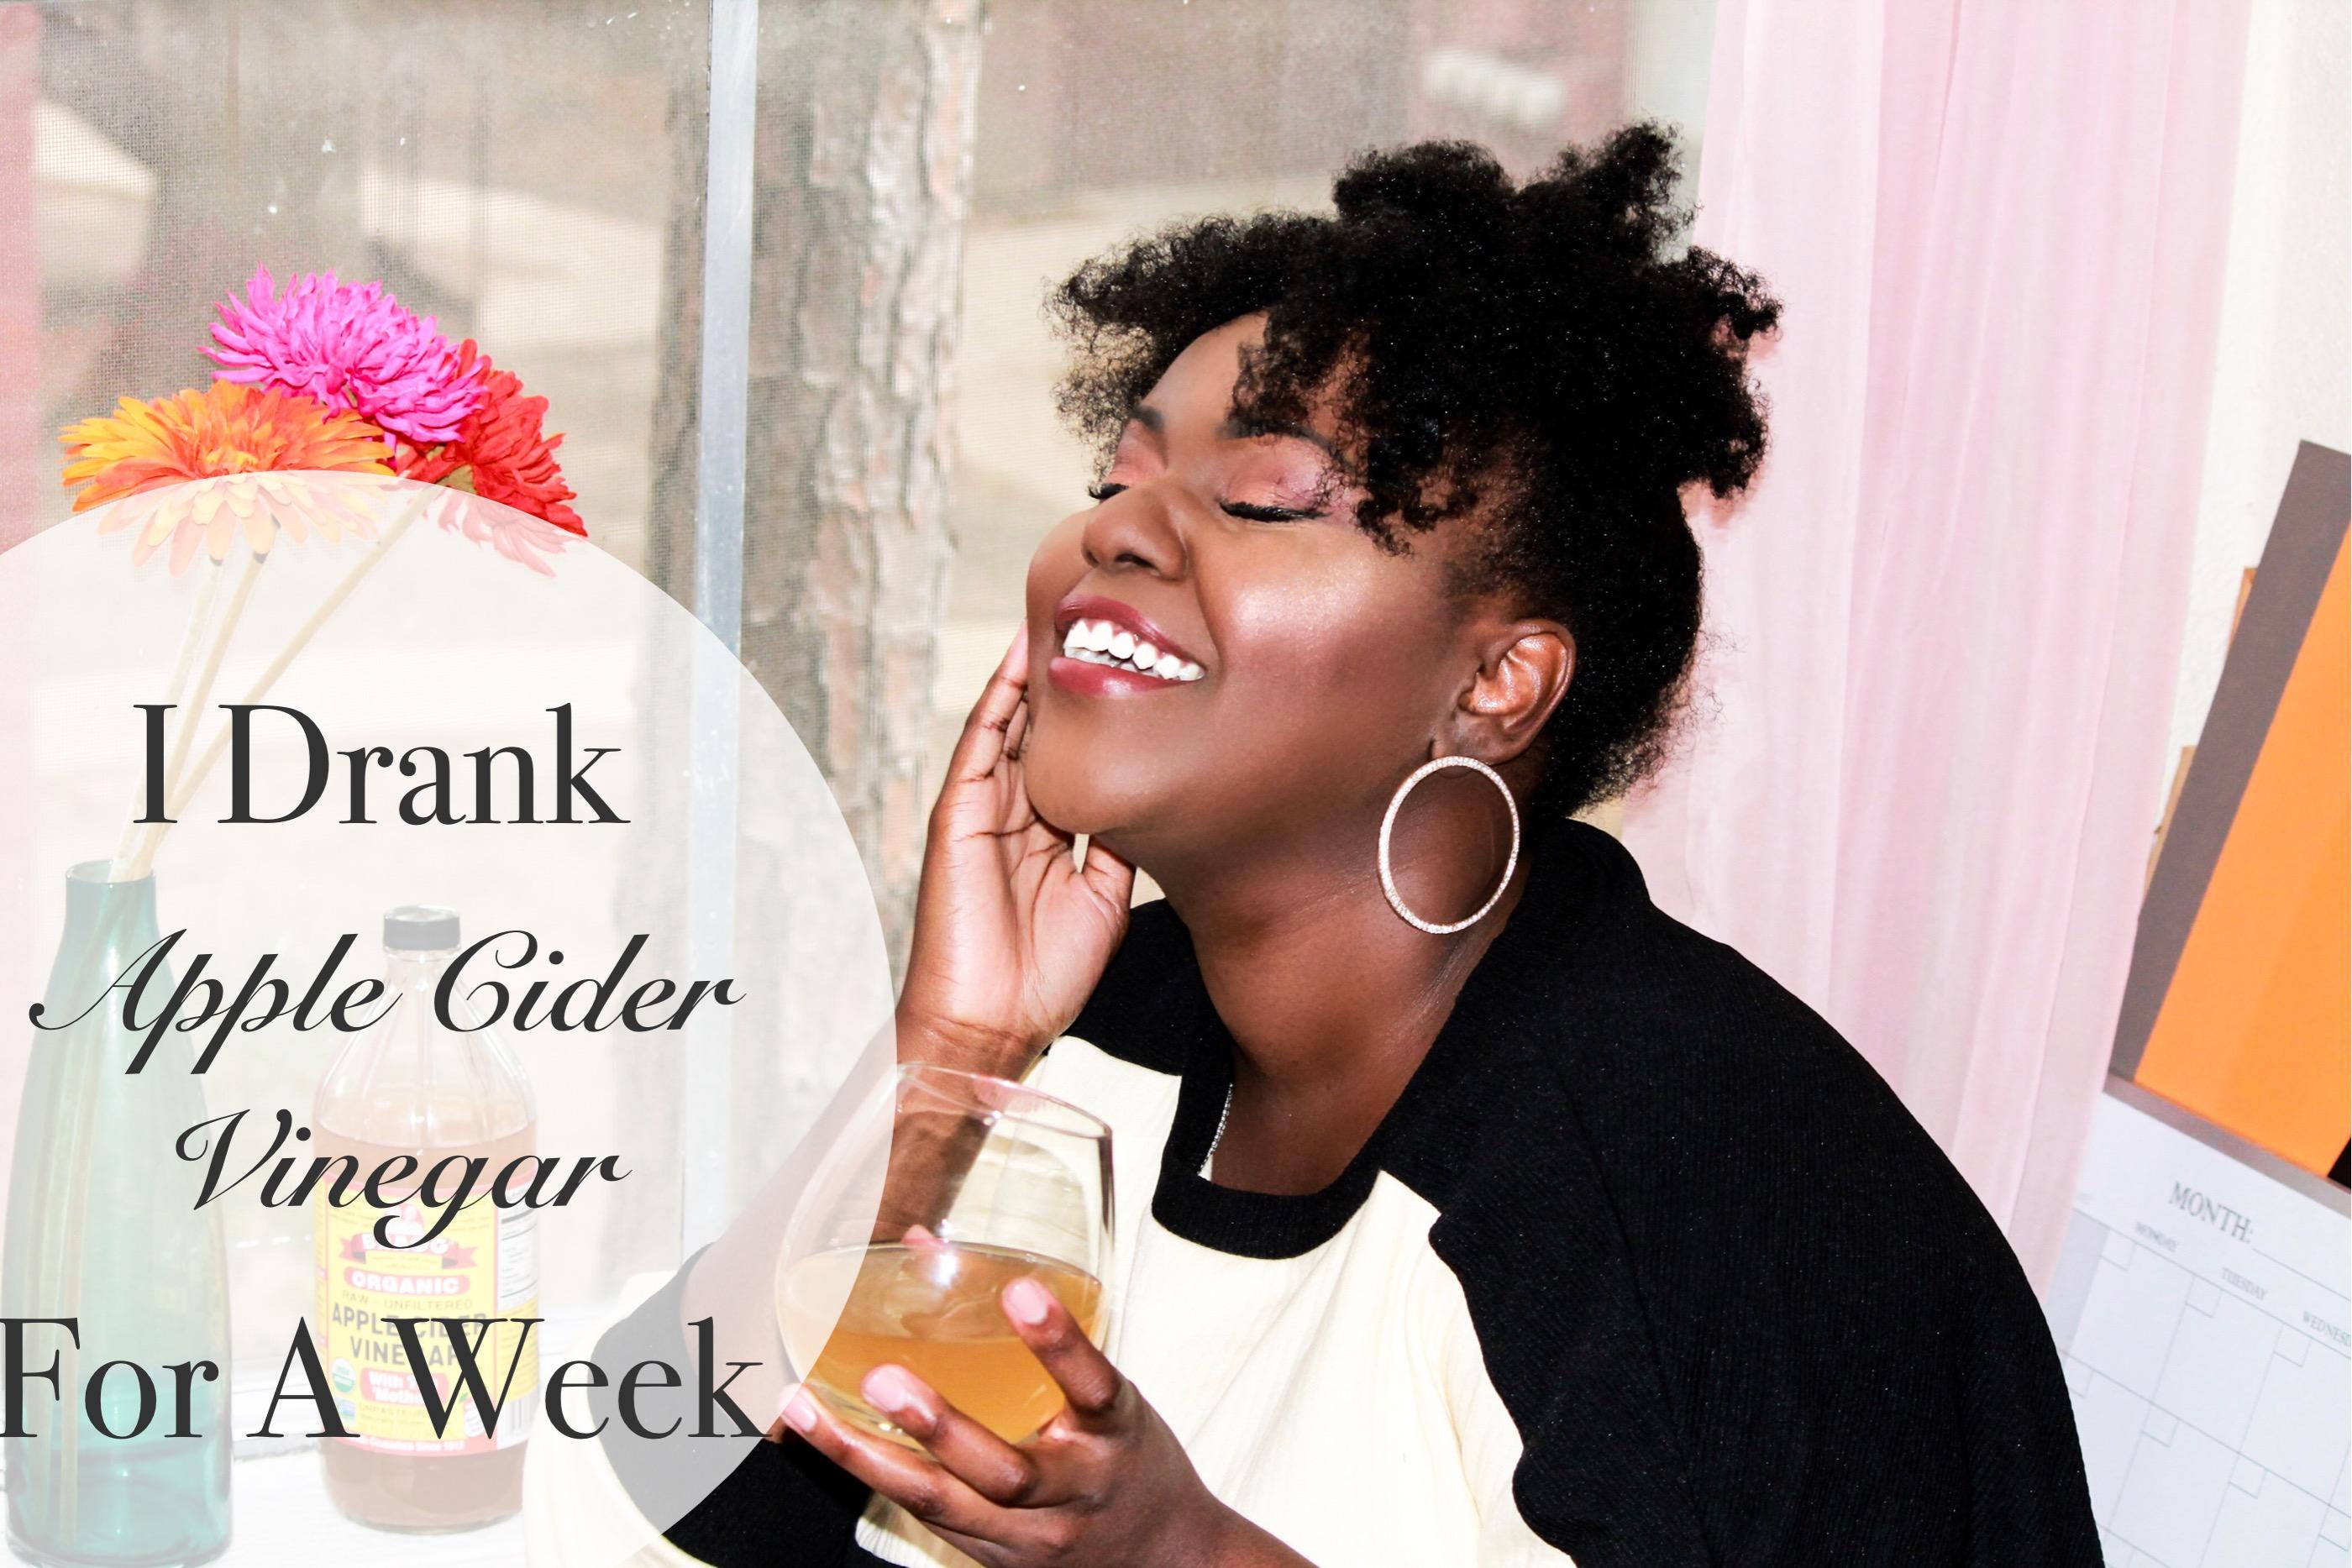 apple cider vinegar diet review, acv detox week, apple cider vinegar health benefits, apple cider vinegar with the mother, apple cider, acv, braggs apple cider vinegar review,